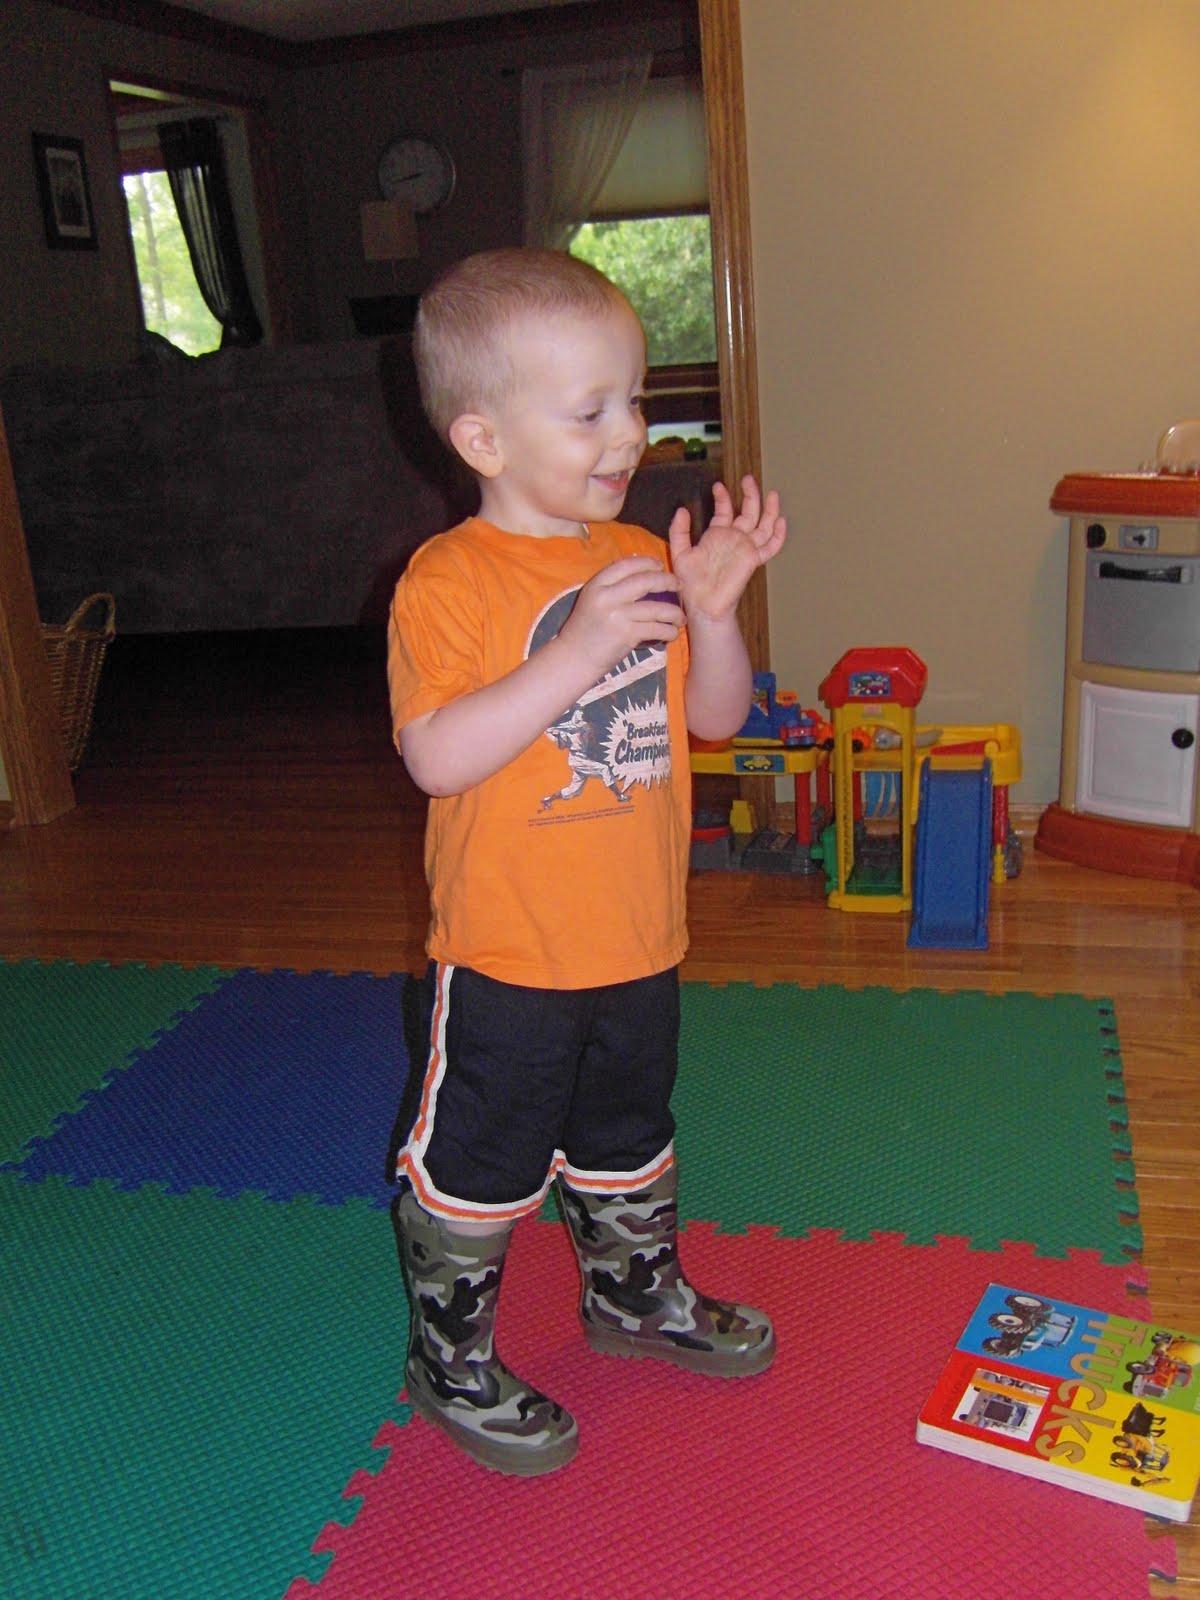 Jaxon and Brady's Journey: Toddler boy antics